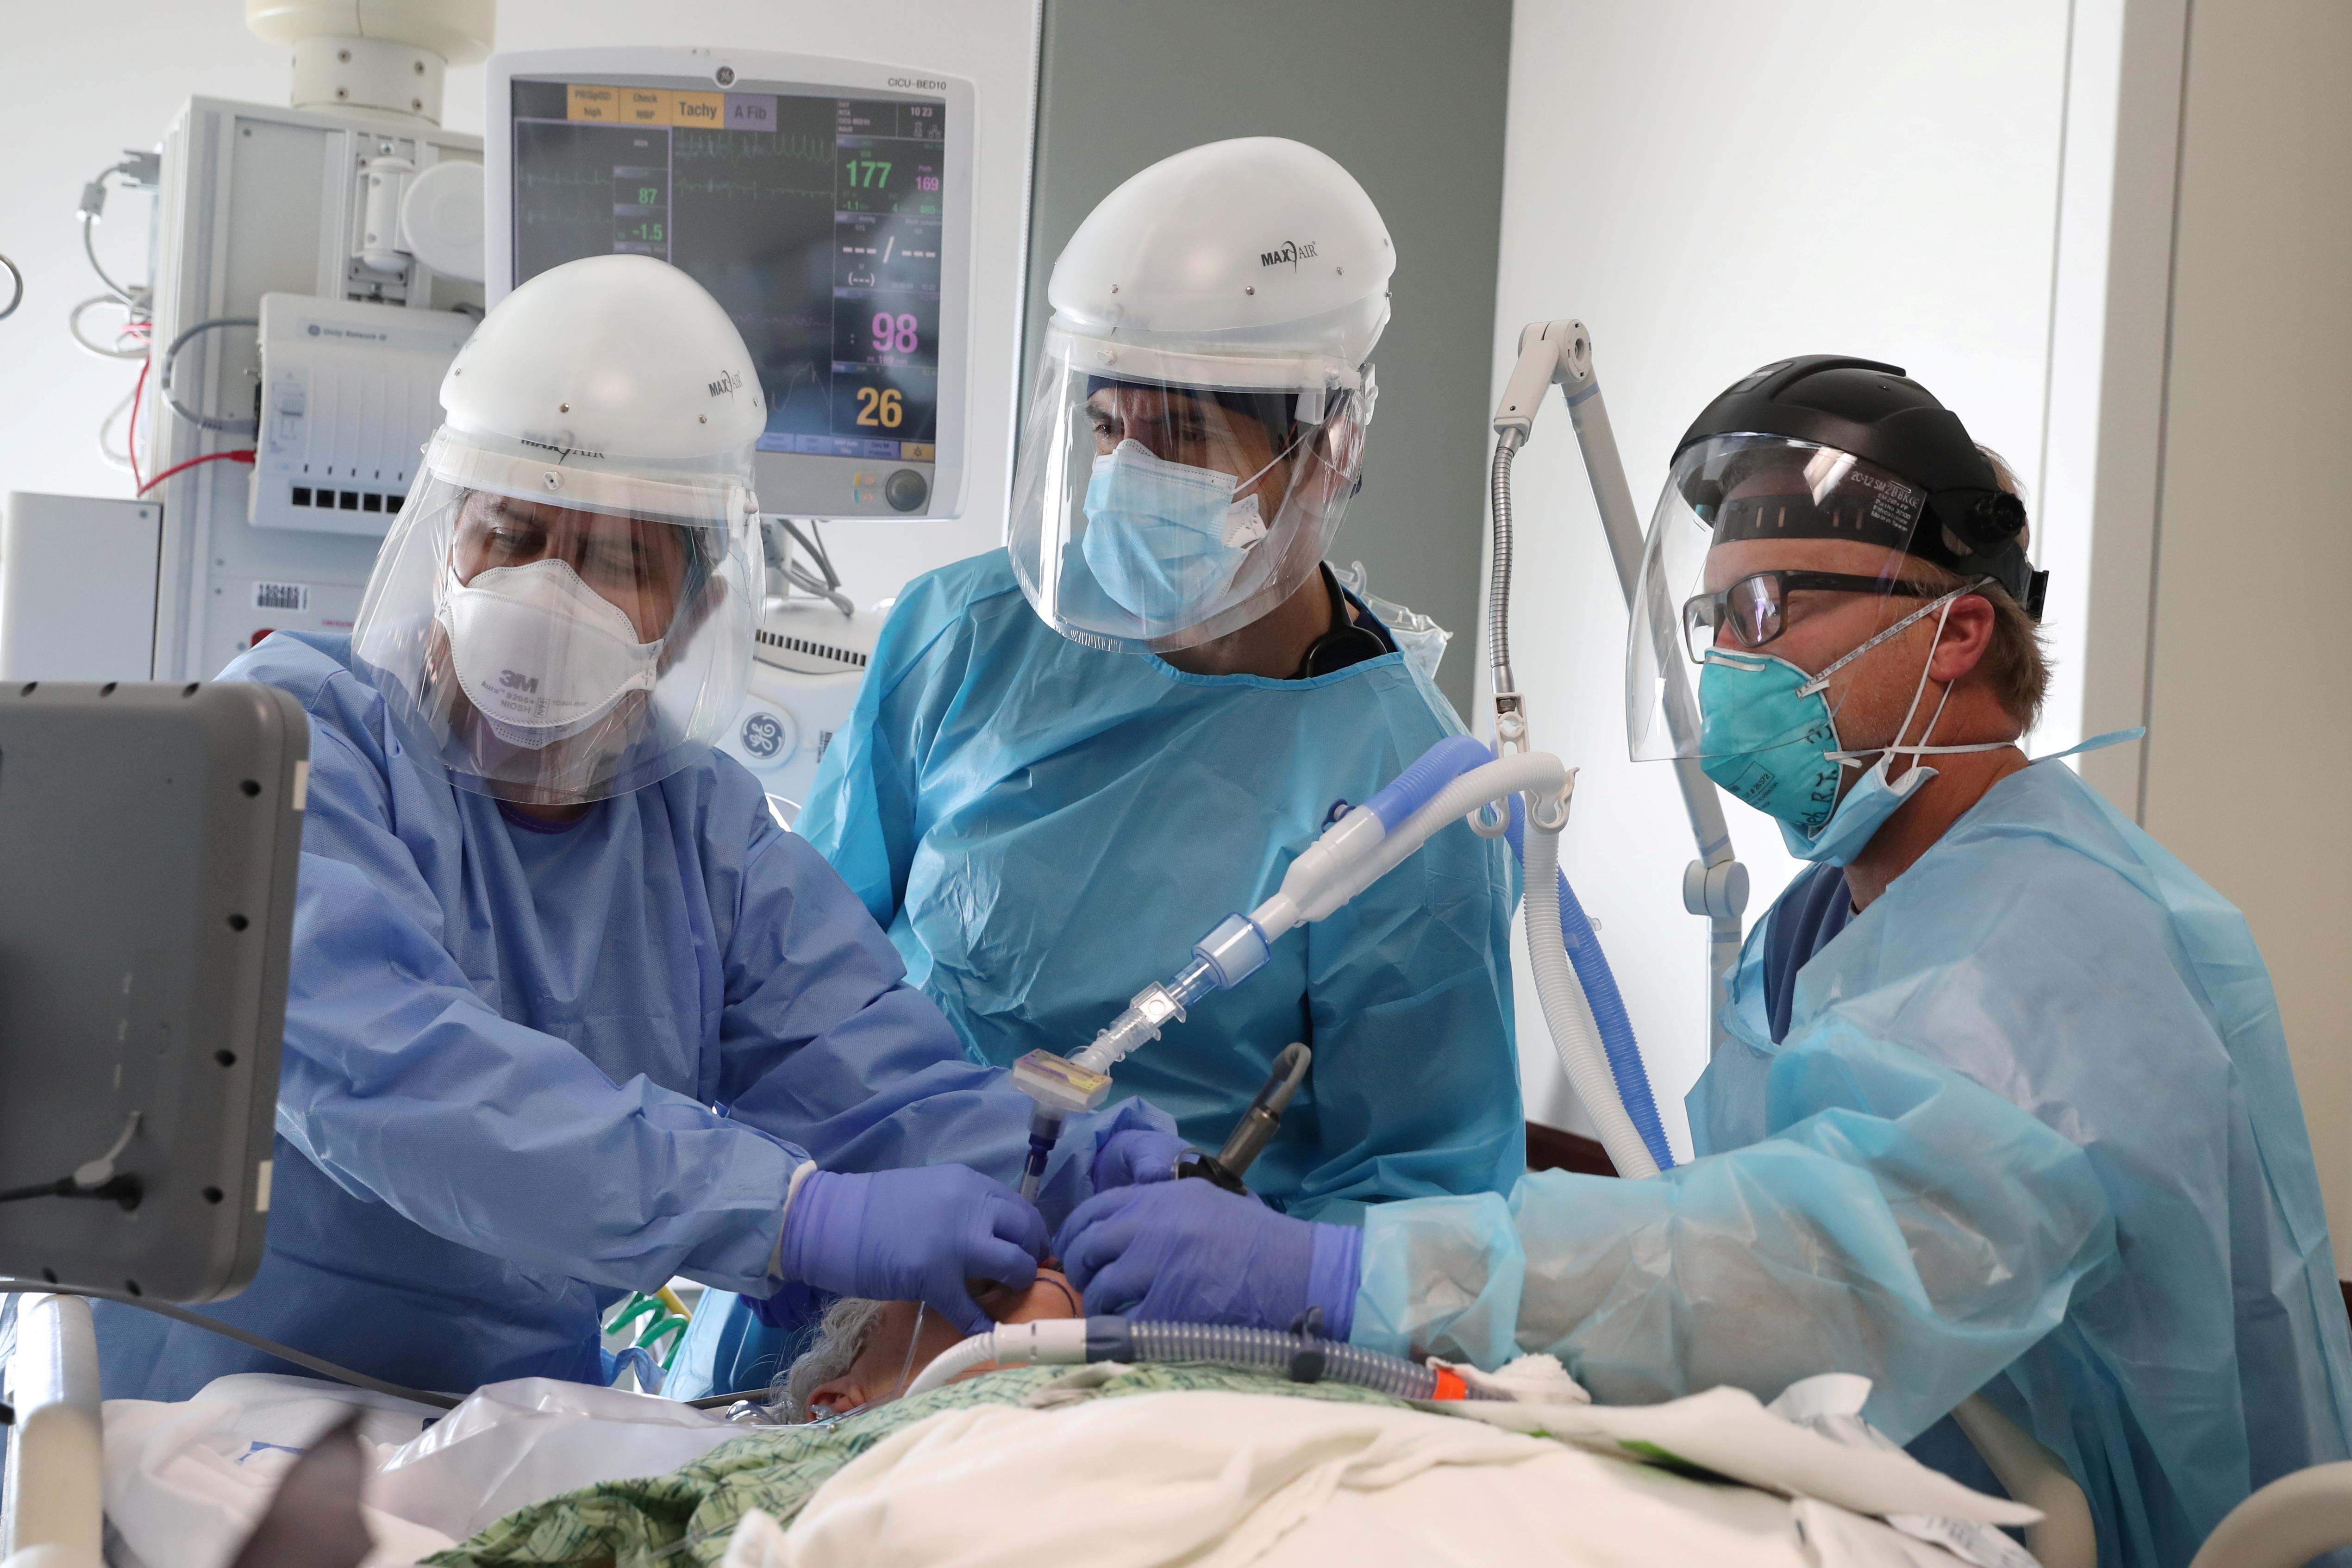 Dr. Dan Ponticiello, 43, and Dr. Gabriel Gomez, 40, intubate a coronavirus disease (COVID-19) patient in the COVID-19 ICU at Providence Mission Hospital in Mission Viejo, California, U.S., January 8, 2021. REUTERS/Lucy Nicholson/File Photo